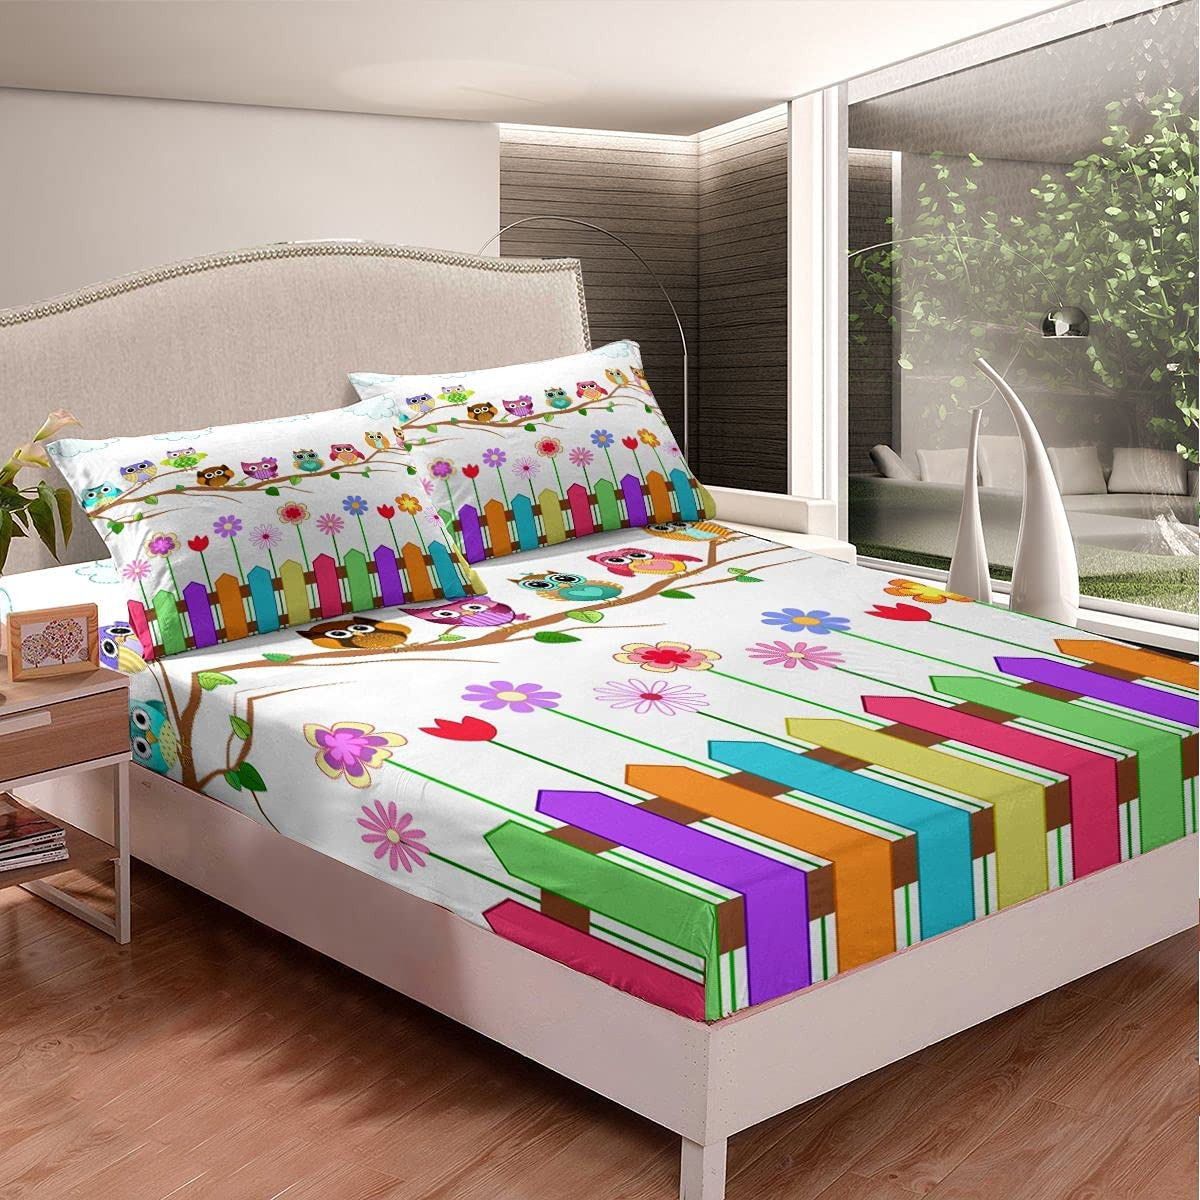 Cartoon Owl Bed Sheet Set Max Department store 57% OFF Decor Branch On Sheets Owls Sunn A